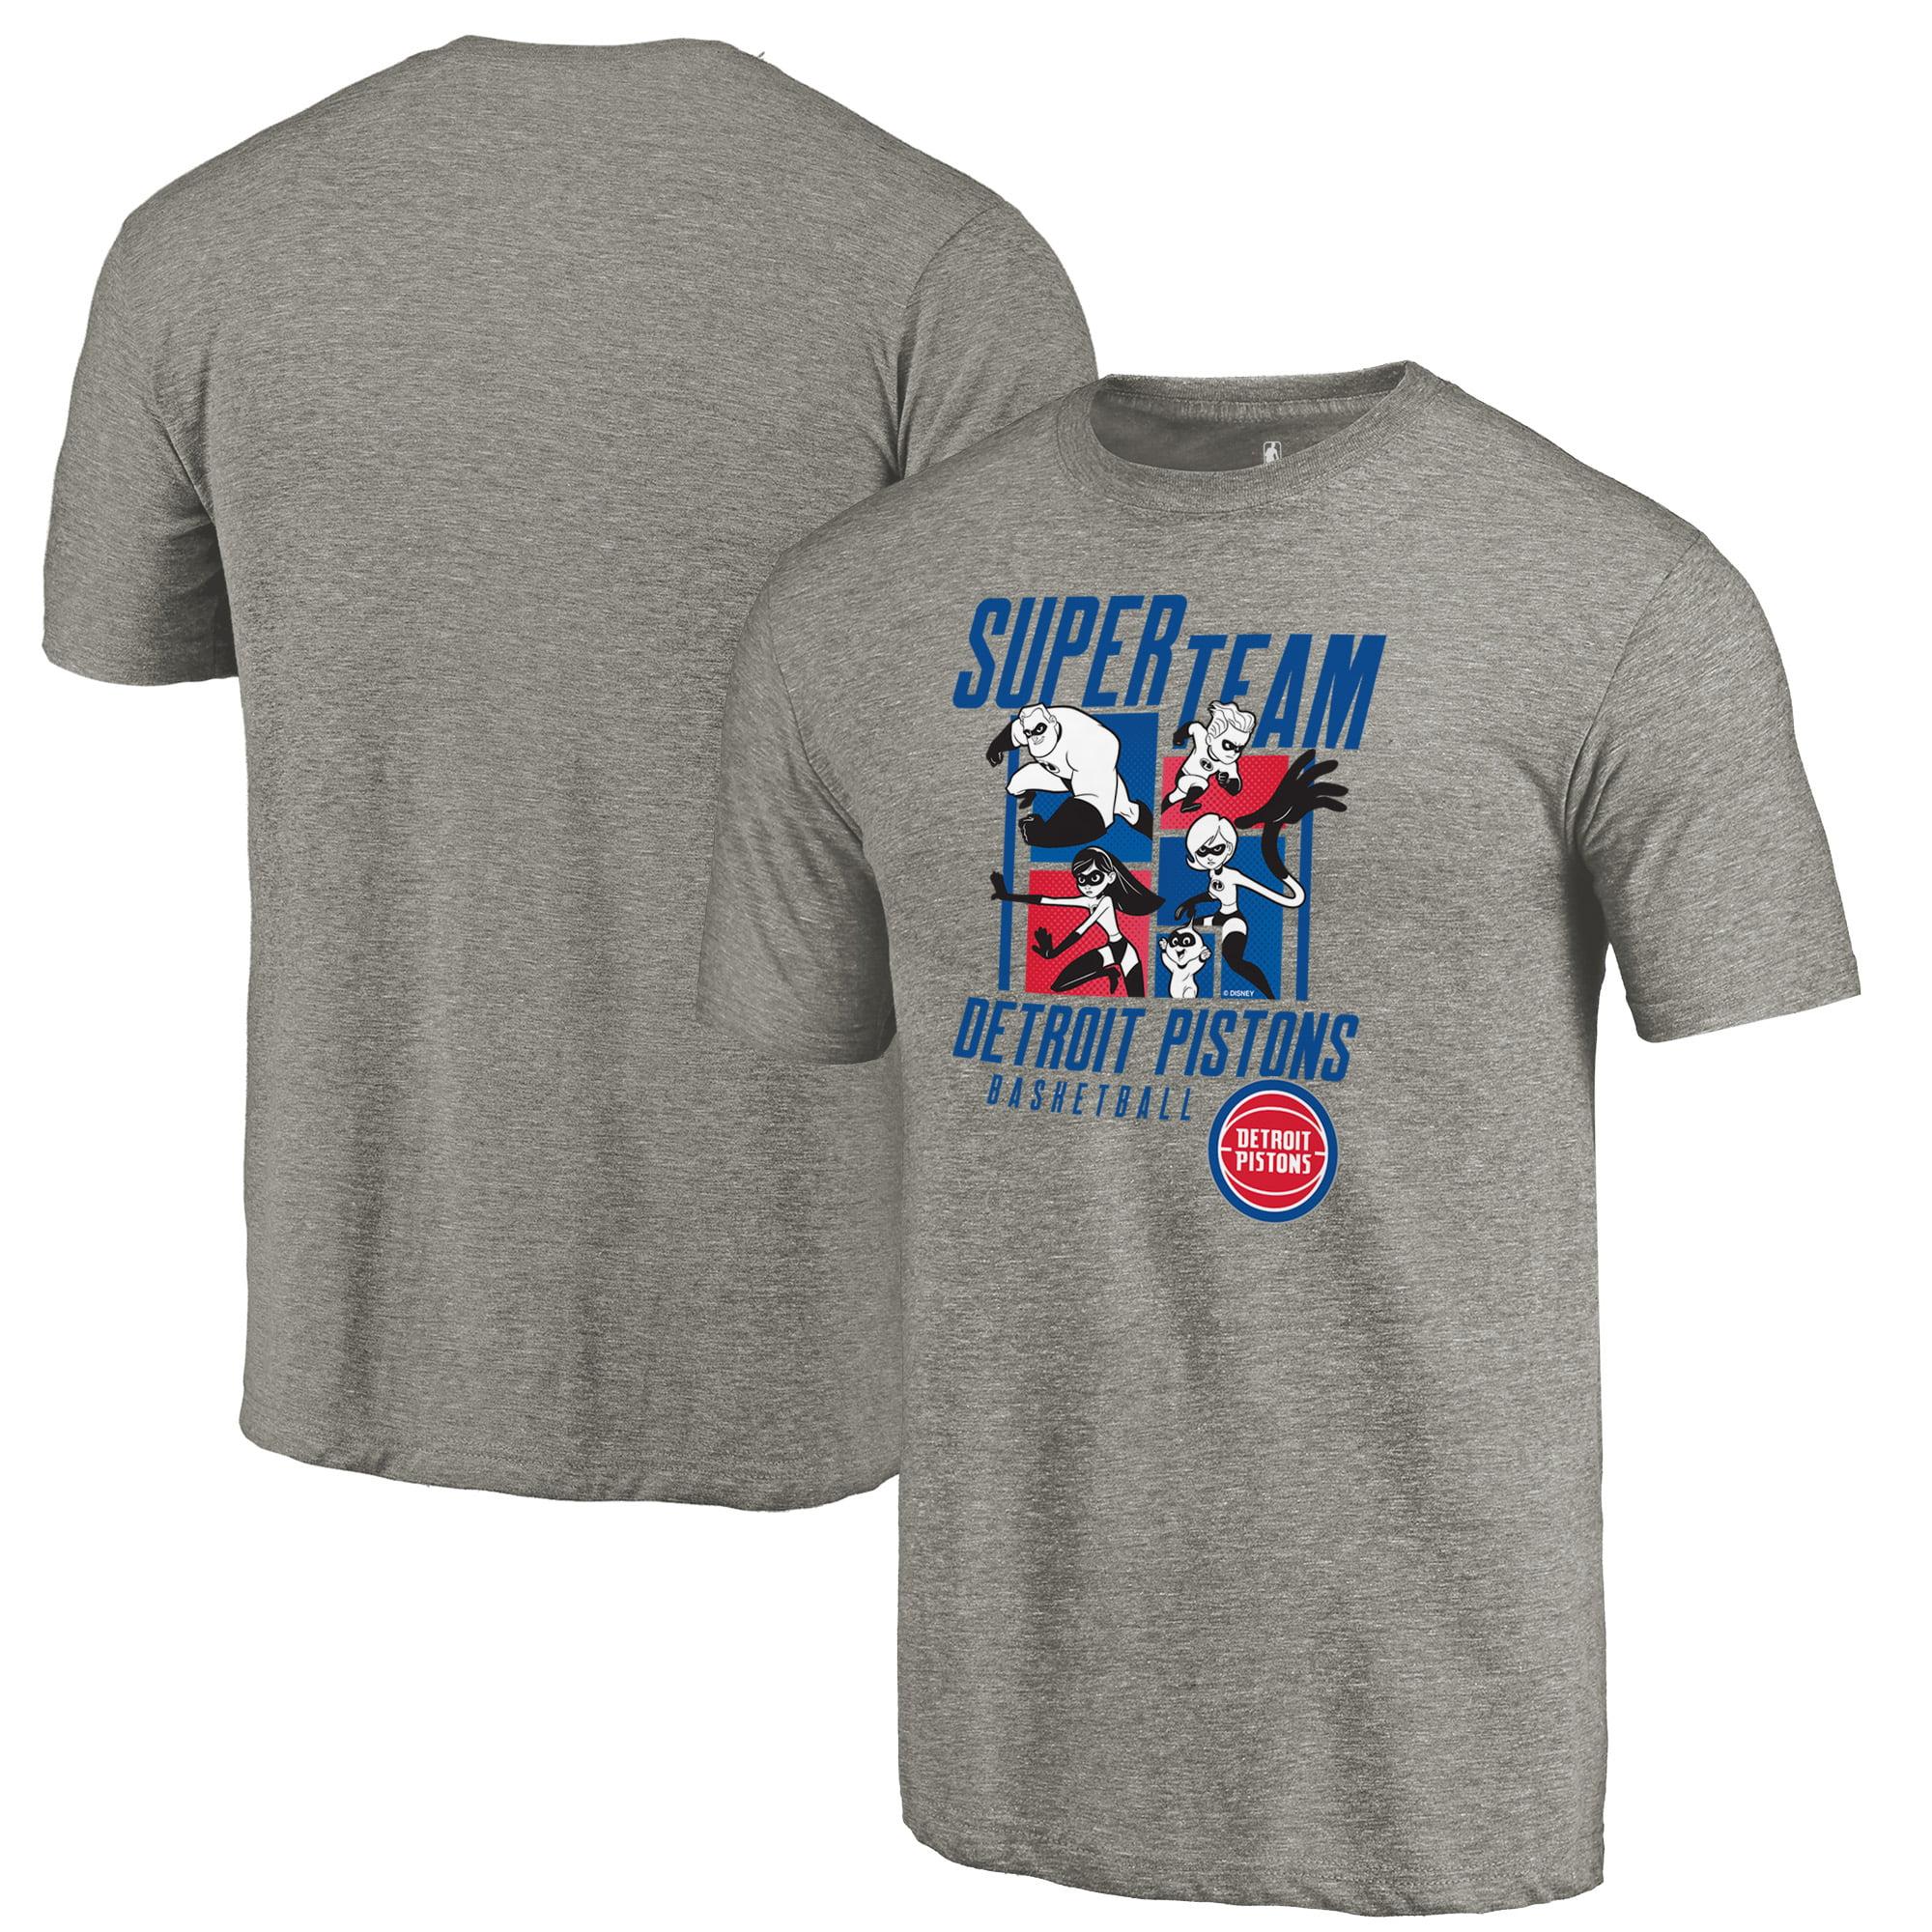 Detroit Pistons Fanatics Branded Disney Pixar The Incredibles Super Team Tri-Blend T-Shirt - Heathered Gray